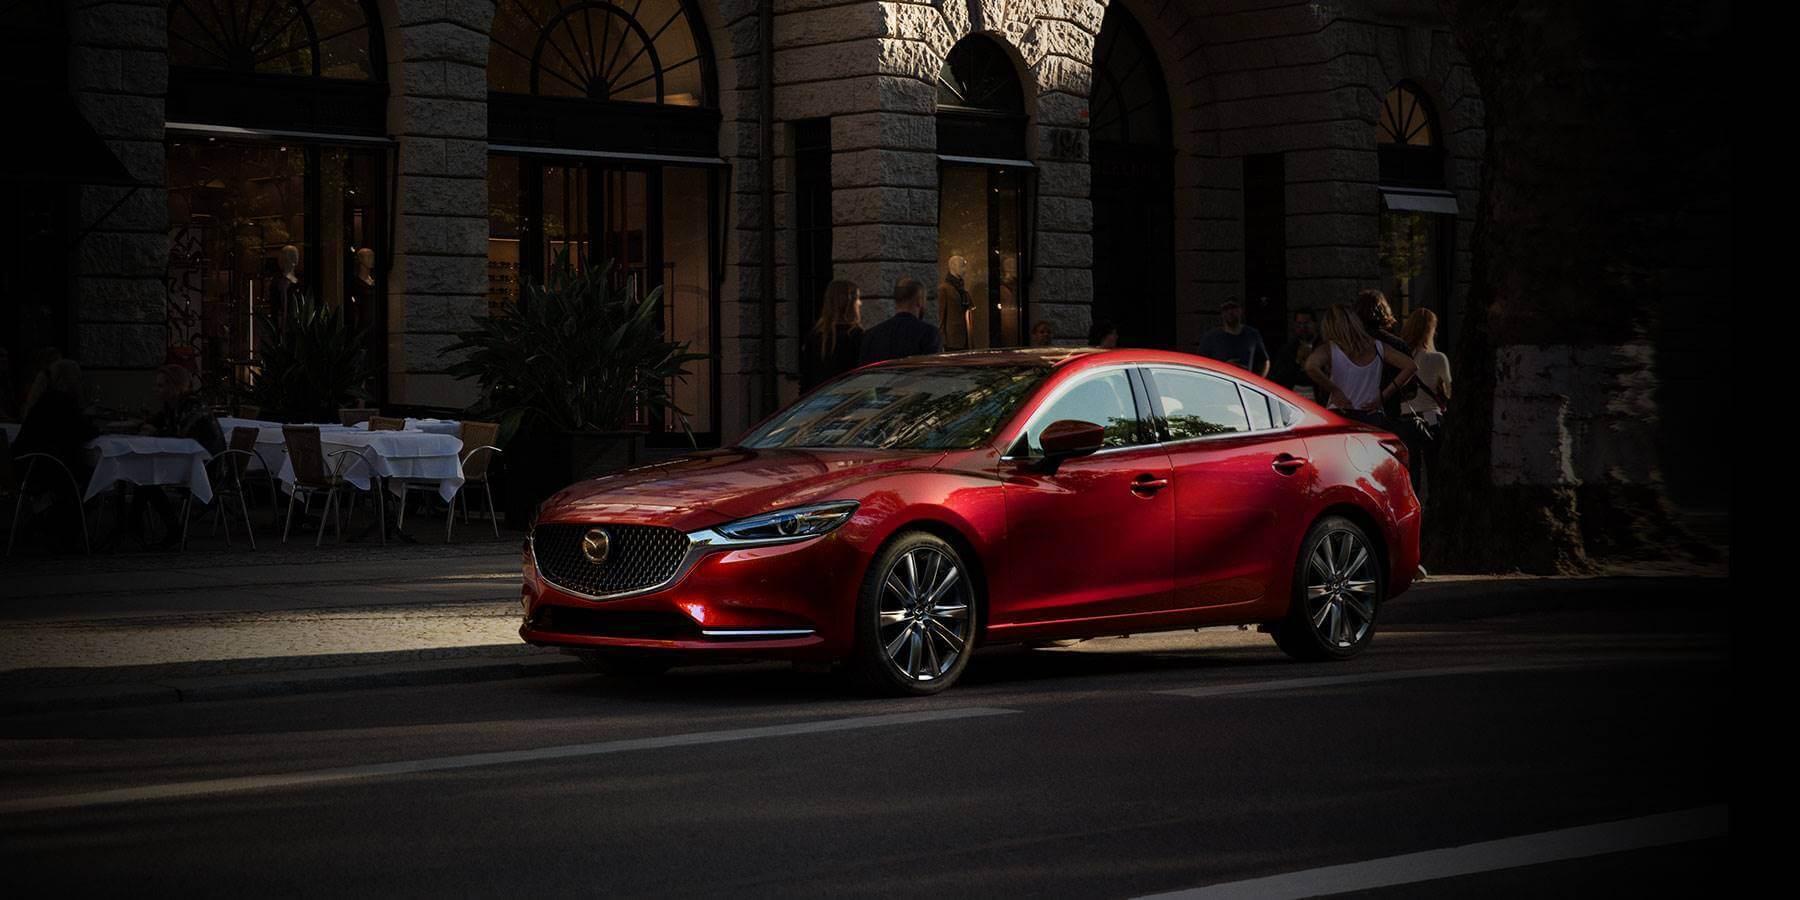 The New 2018 Mazda6 in Sheboygan, WI